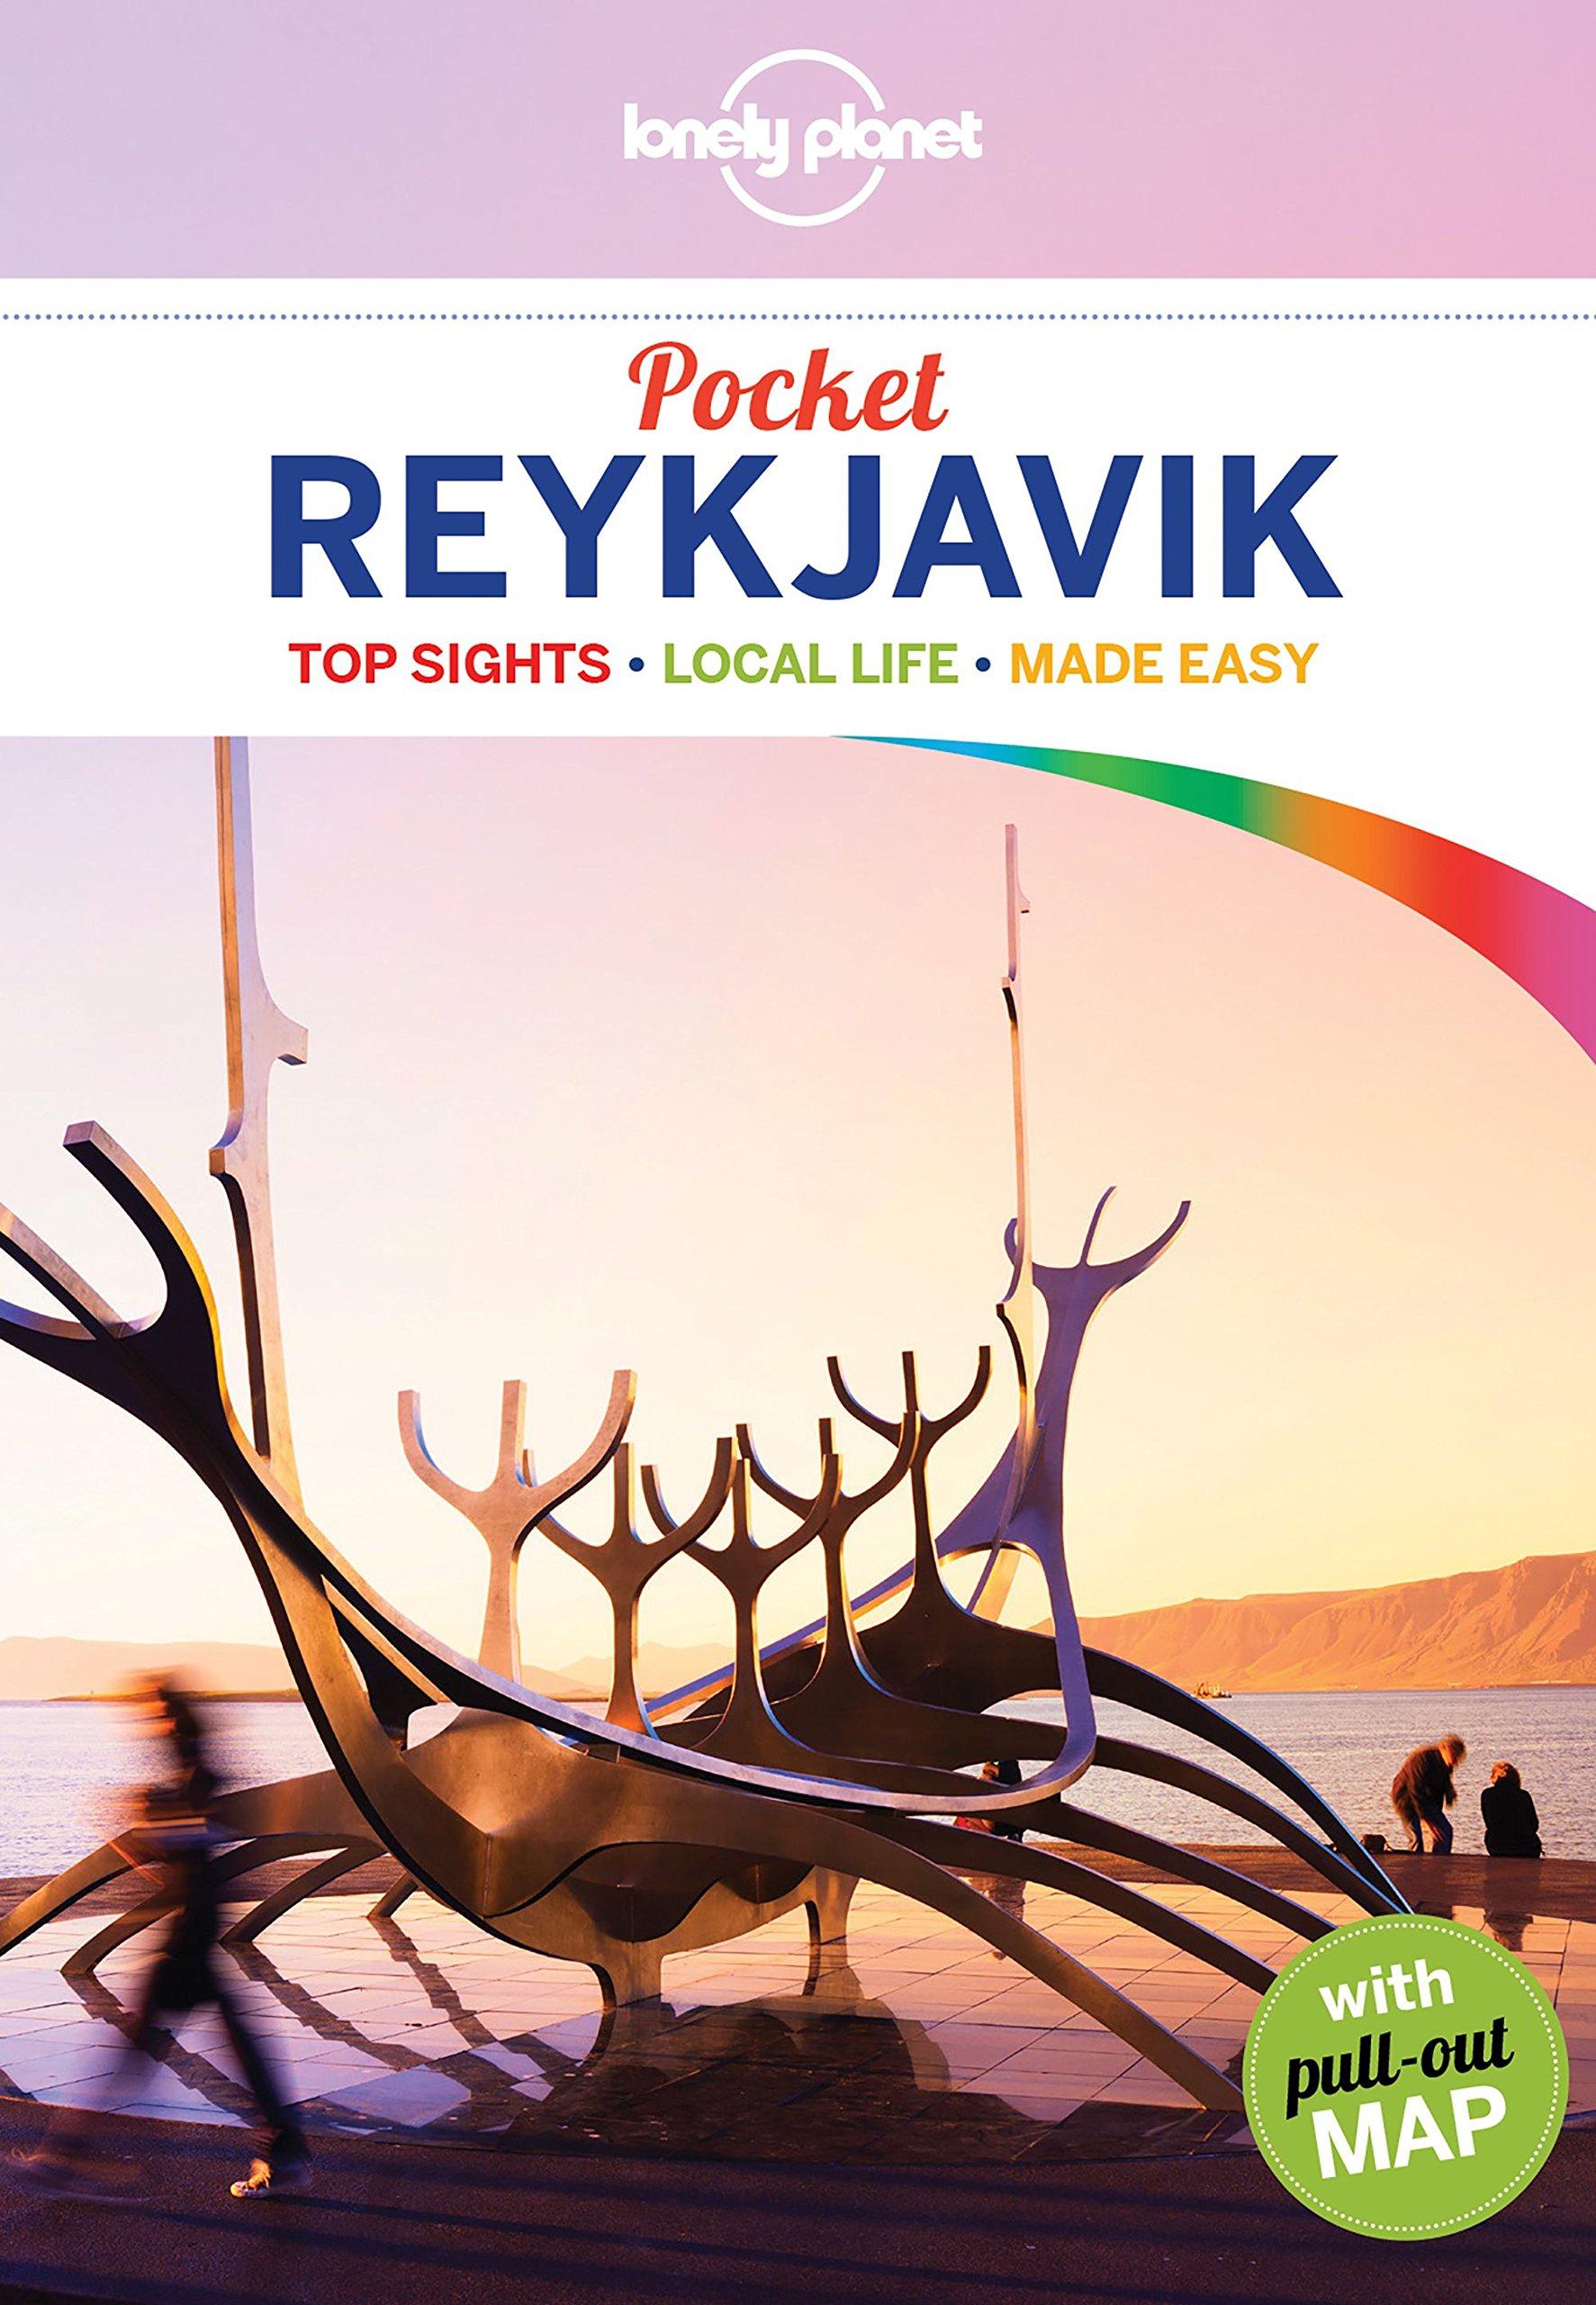 Lonely Planet Pocket Reykjavik (Travel Guide) Paperback – May 16, 2017 Alexis Averbuck 1786575485 Iceland Guidebooks